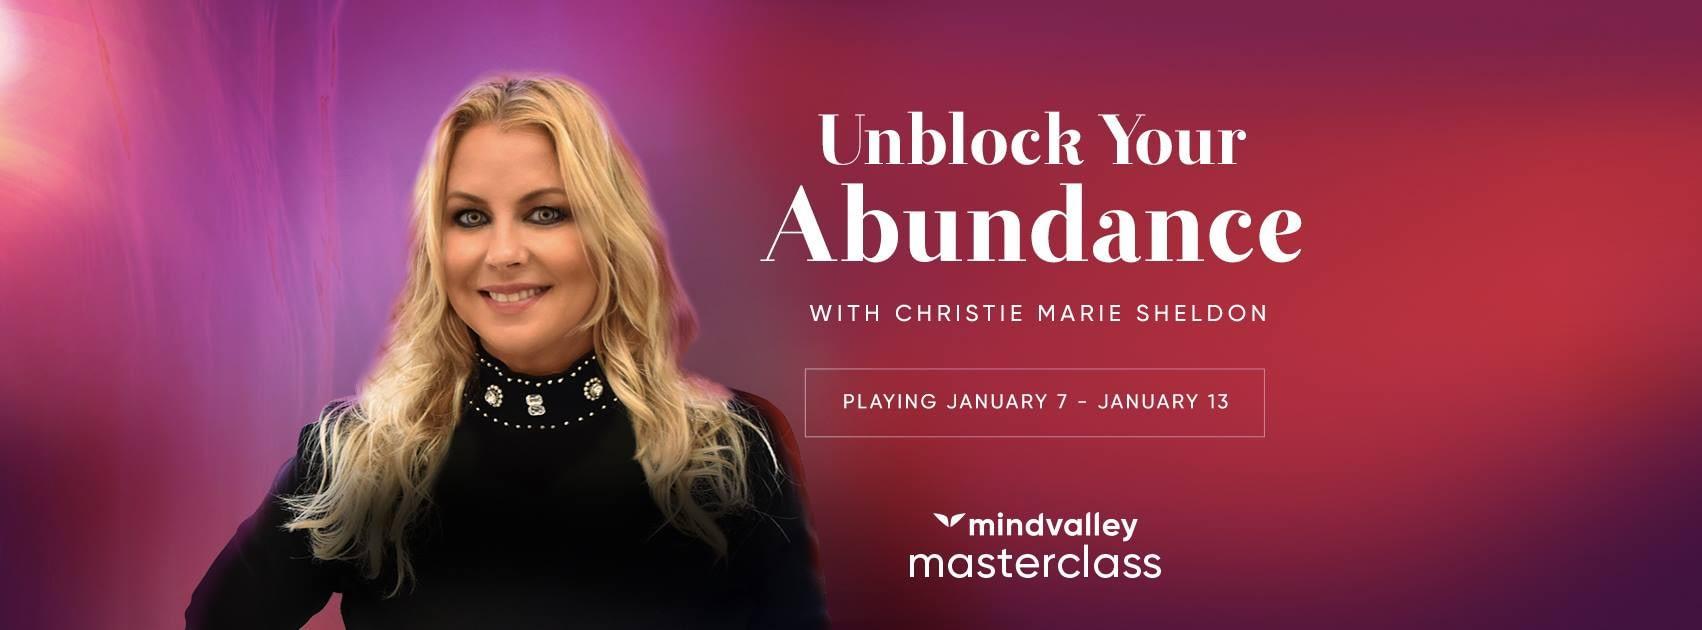 unlimited-abundance-7-jan-2019